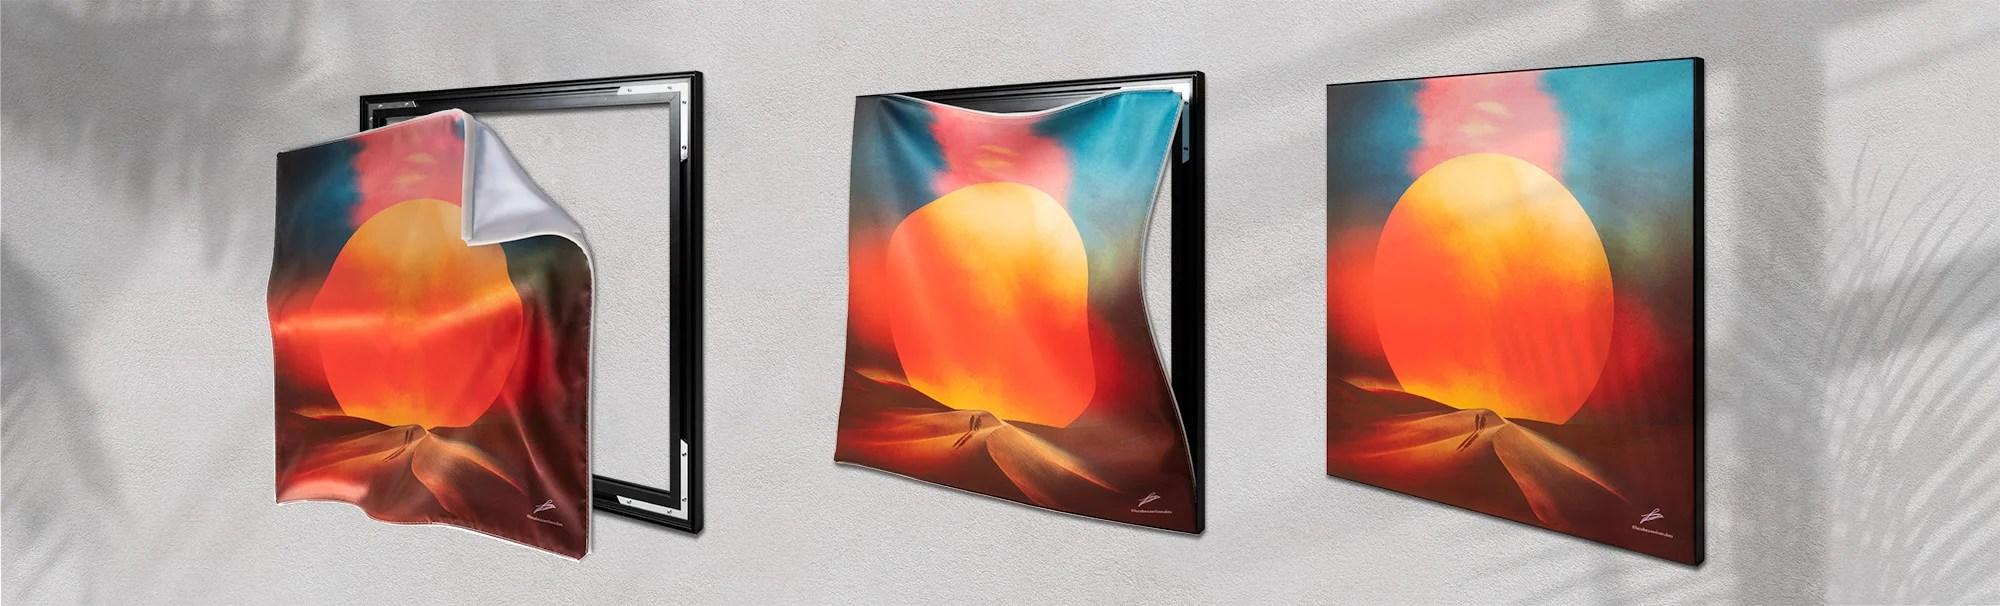 Big Wall ArtArtfab Prints Interchangeable home decor displays